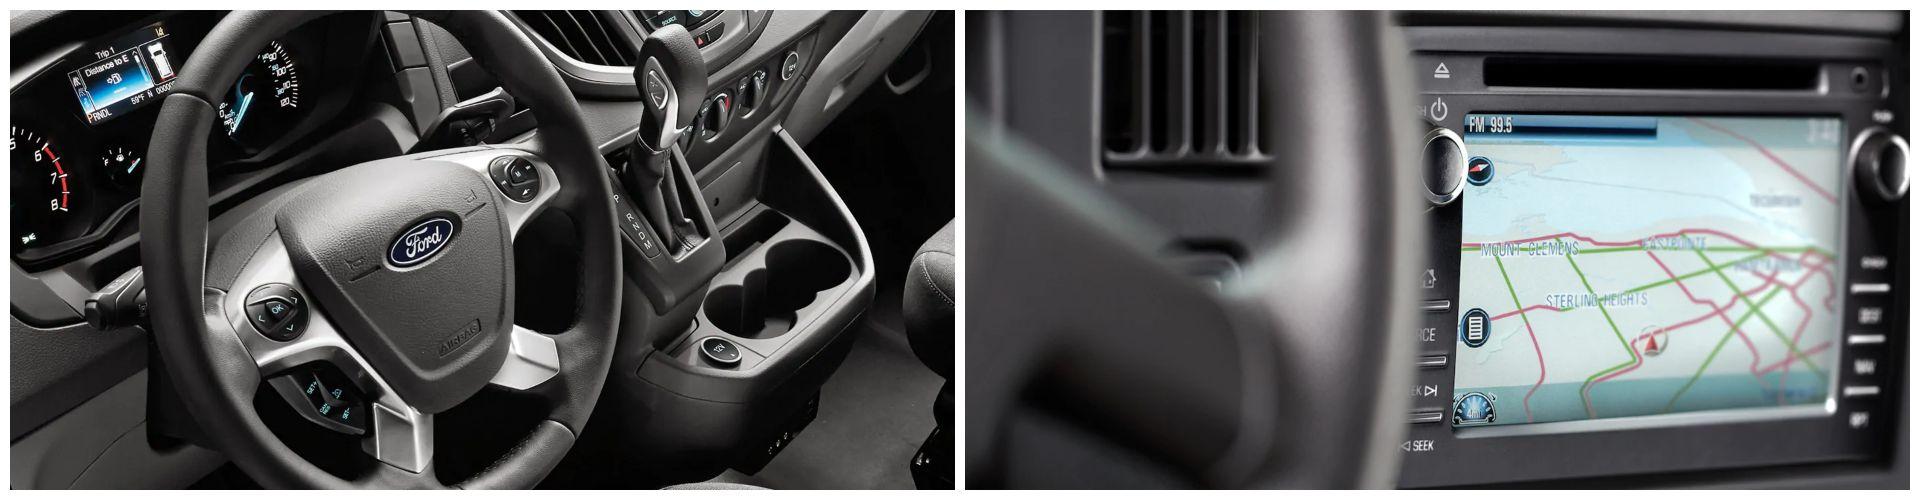 Interior - Ford Transit vs. Chevrolet Express